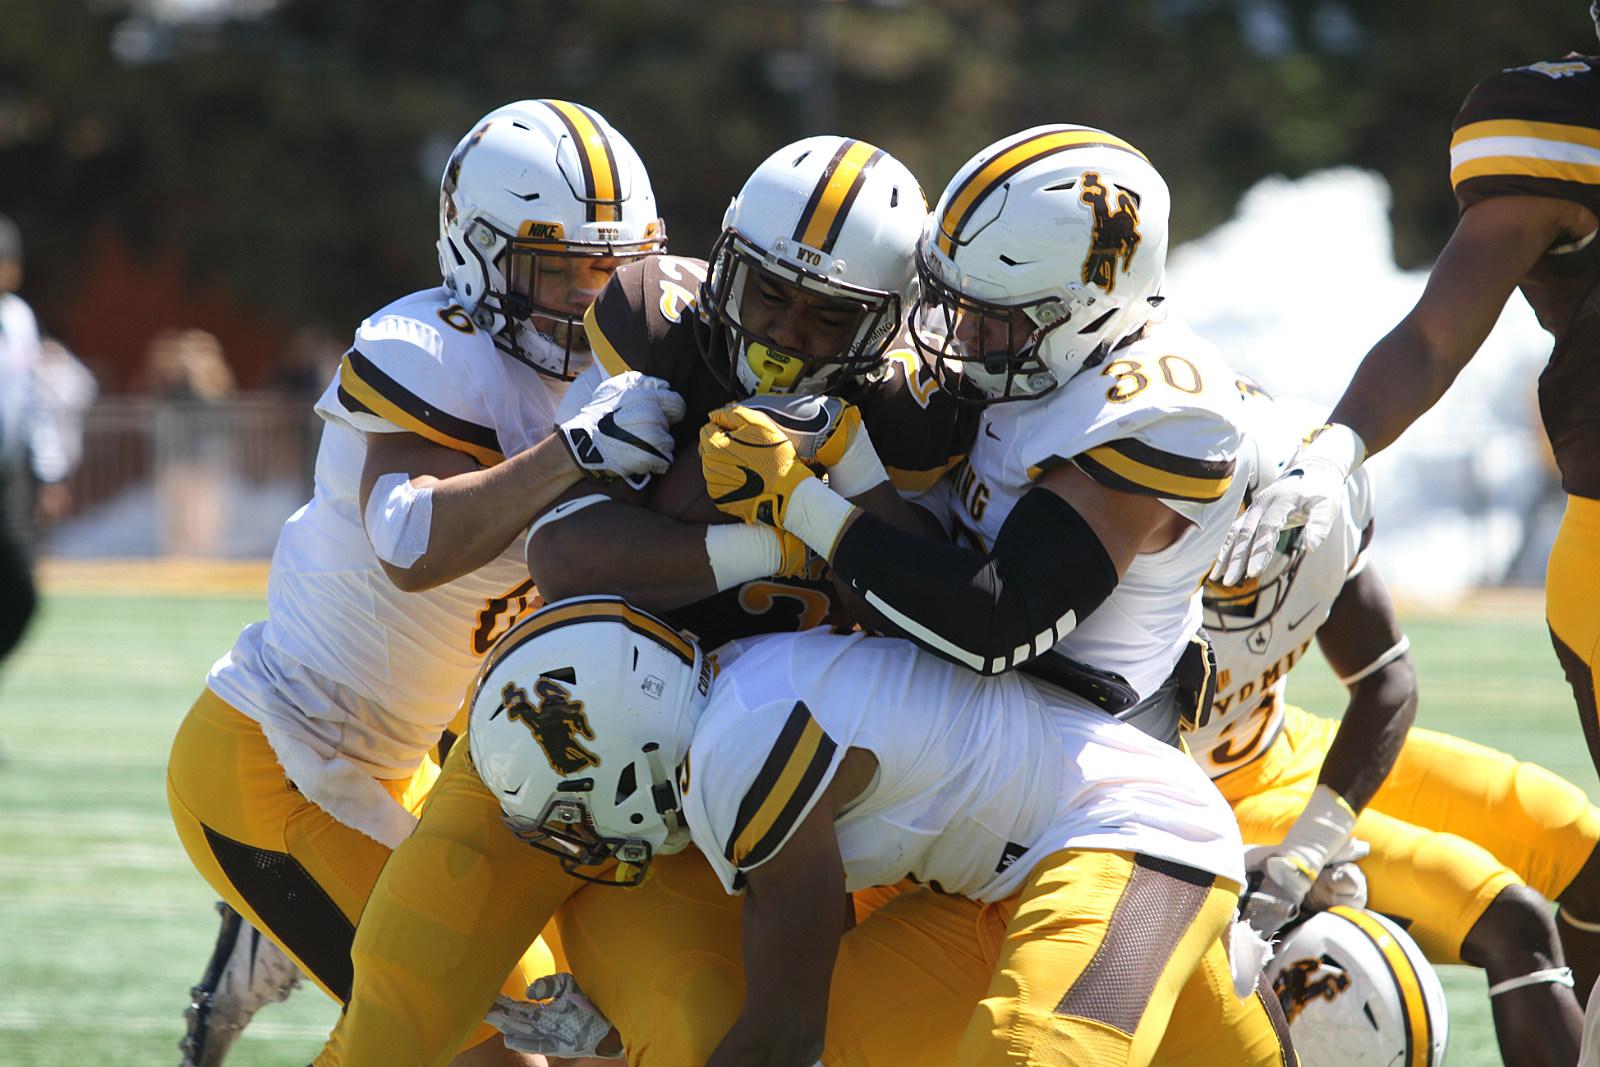 Wyoming Football Gold Defense run stop, Spring Game 2017